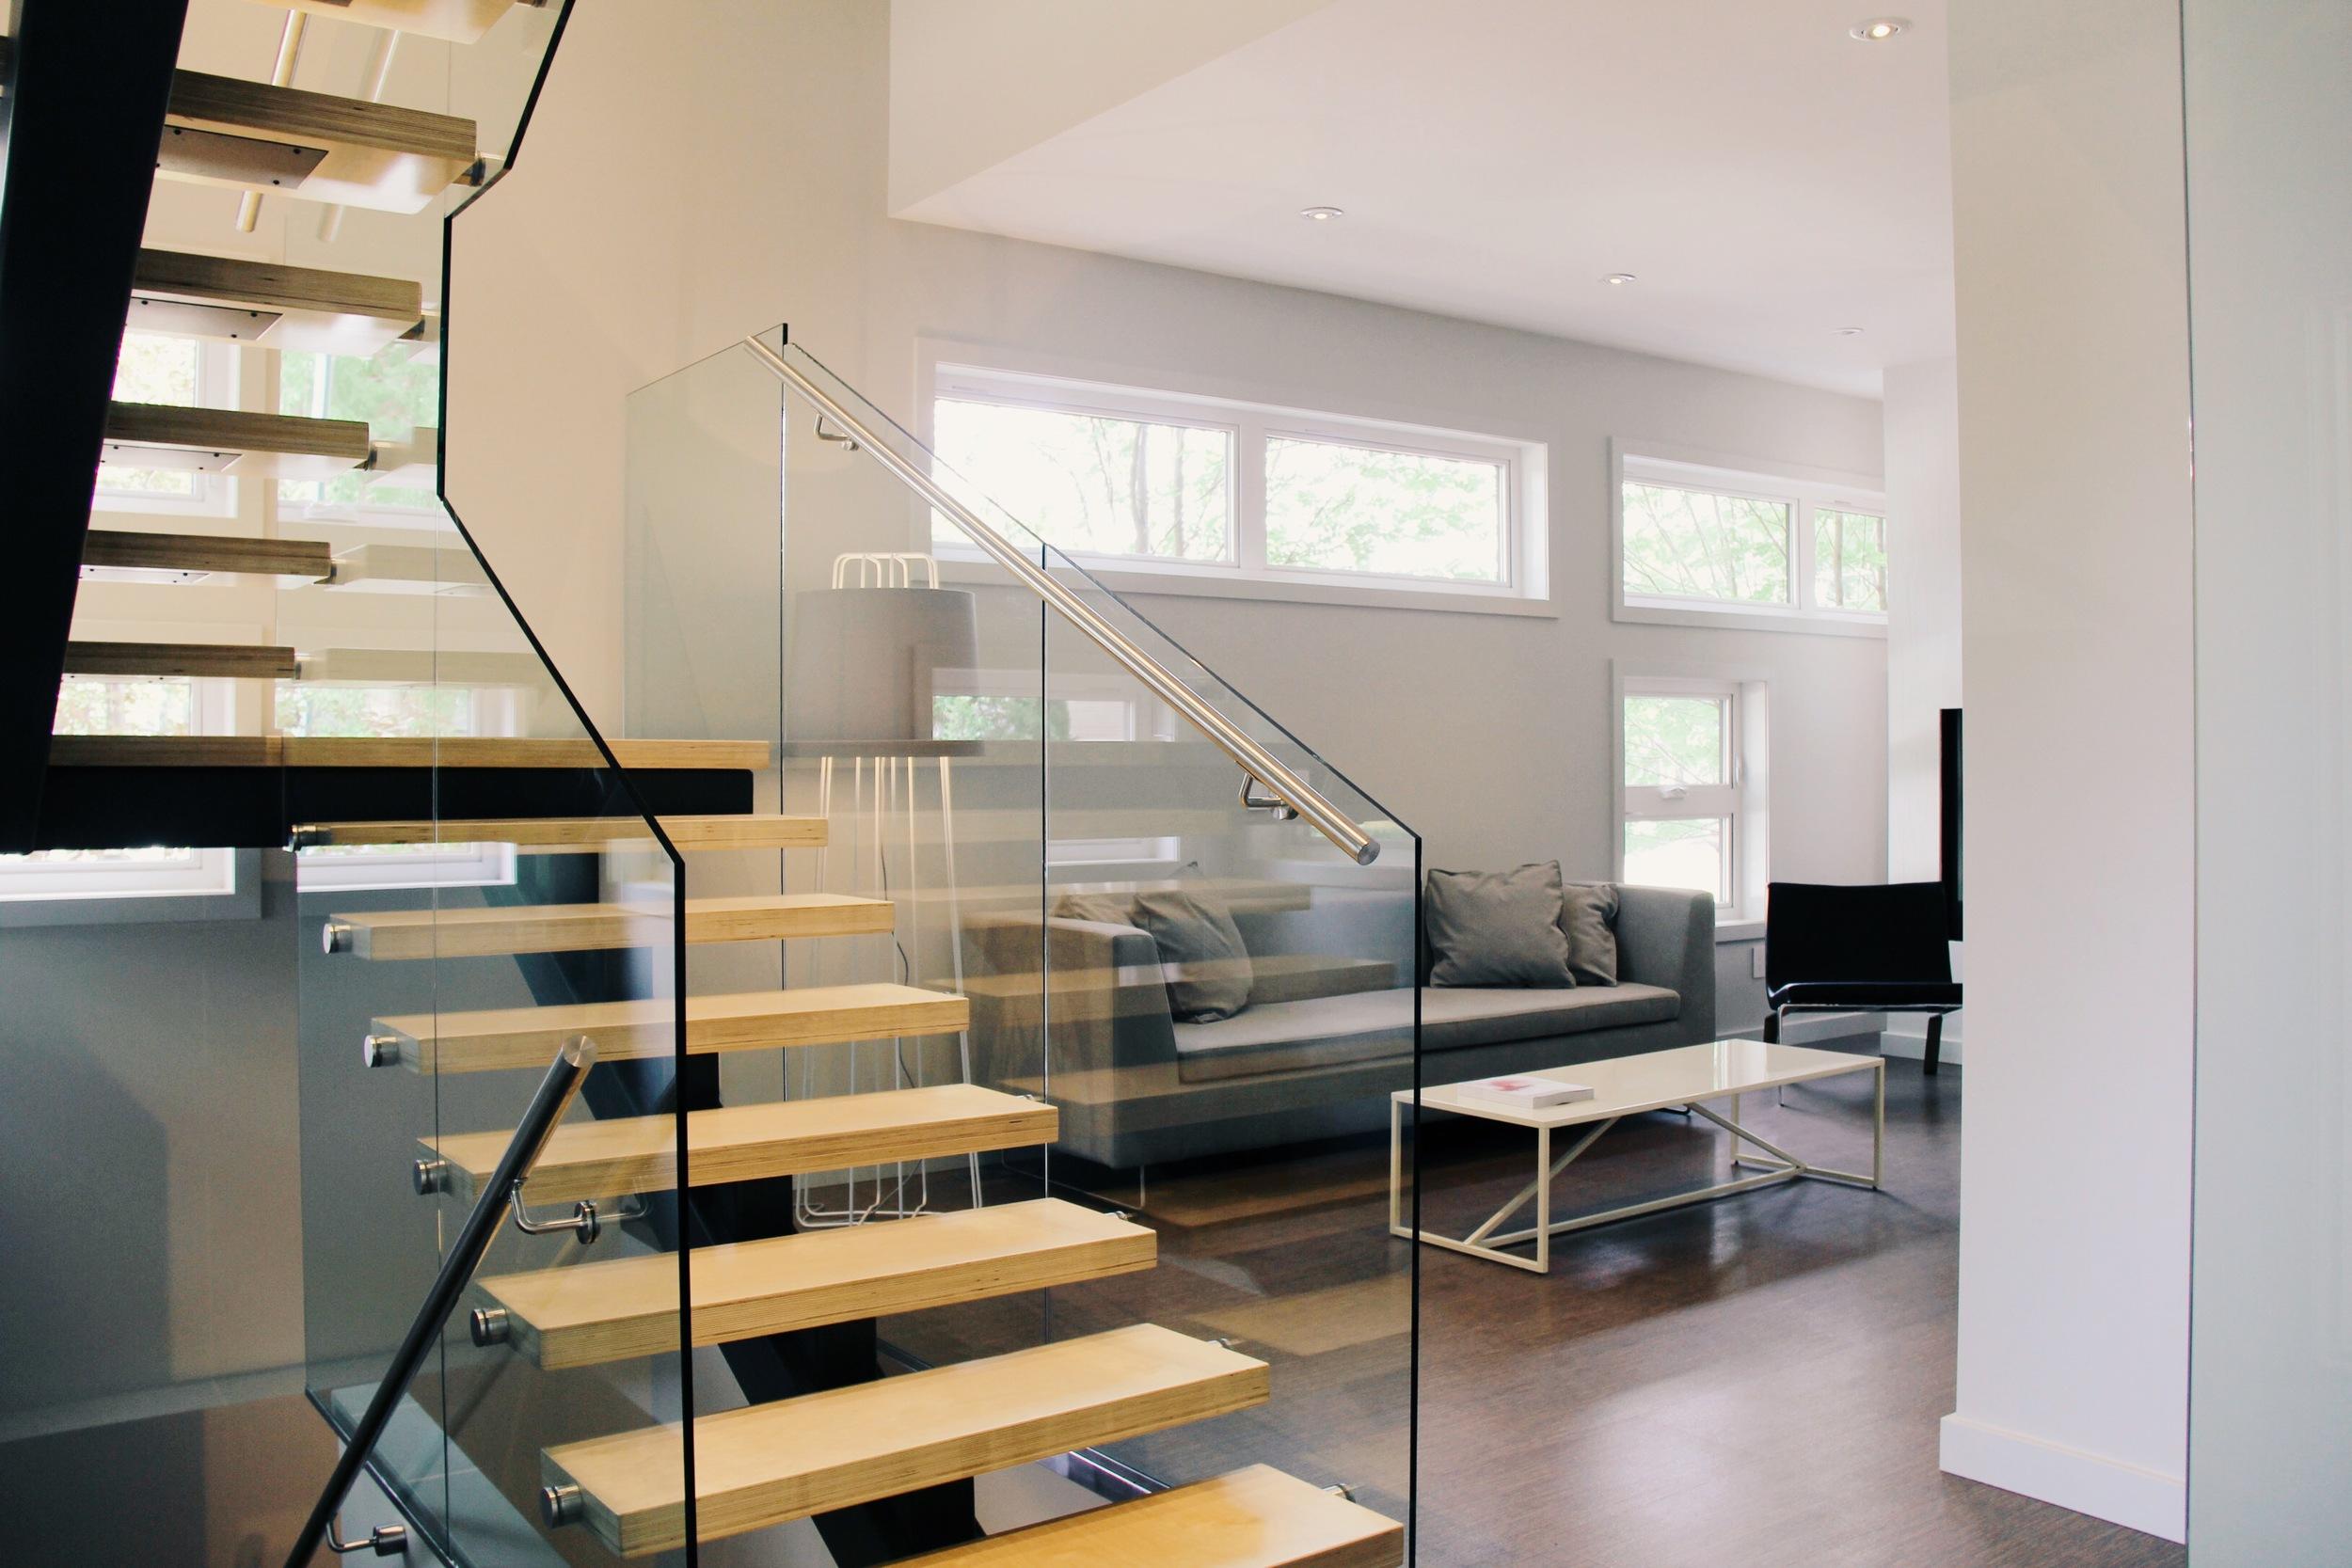 616 Temperance Street - $849,000